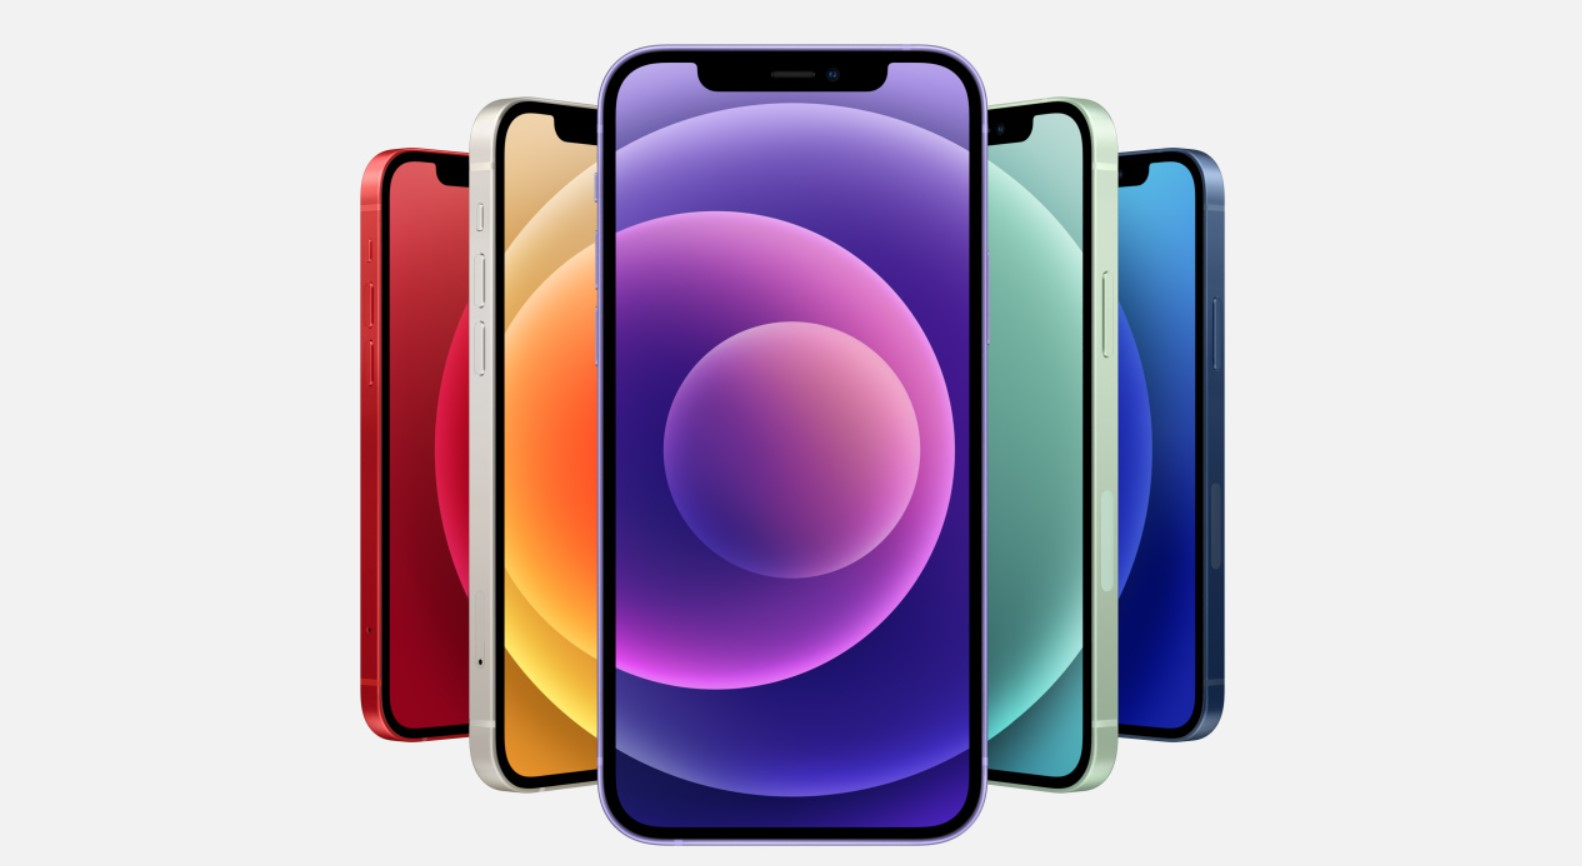 Download iPhone 12 Purple Wallpapers 2021